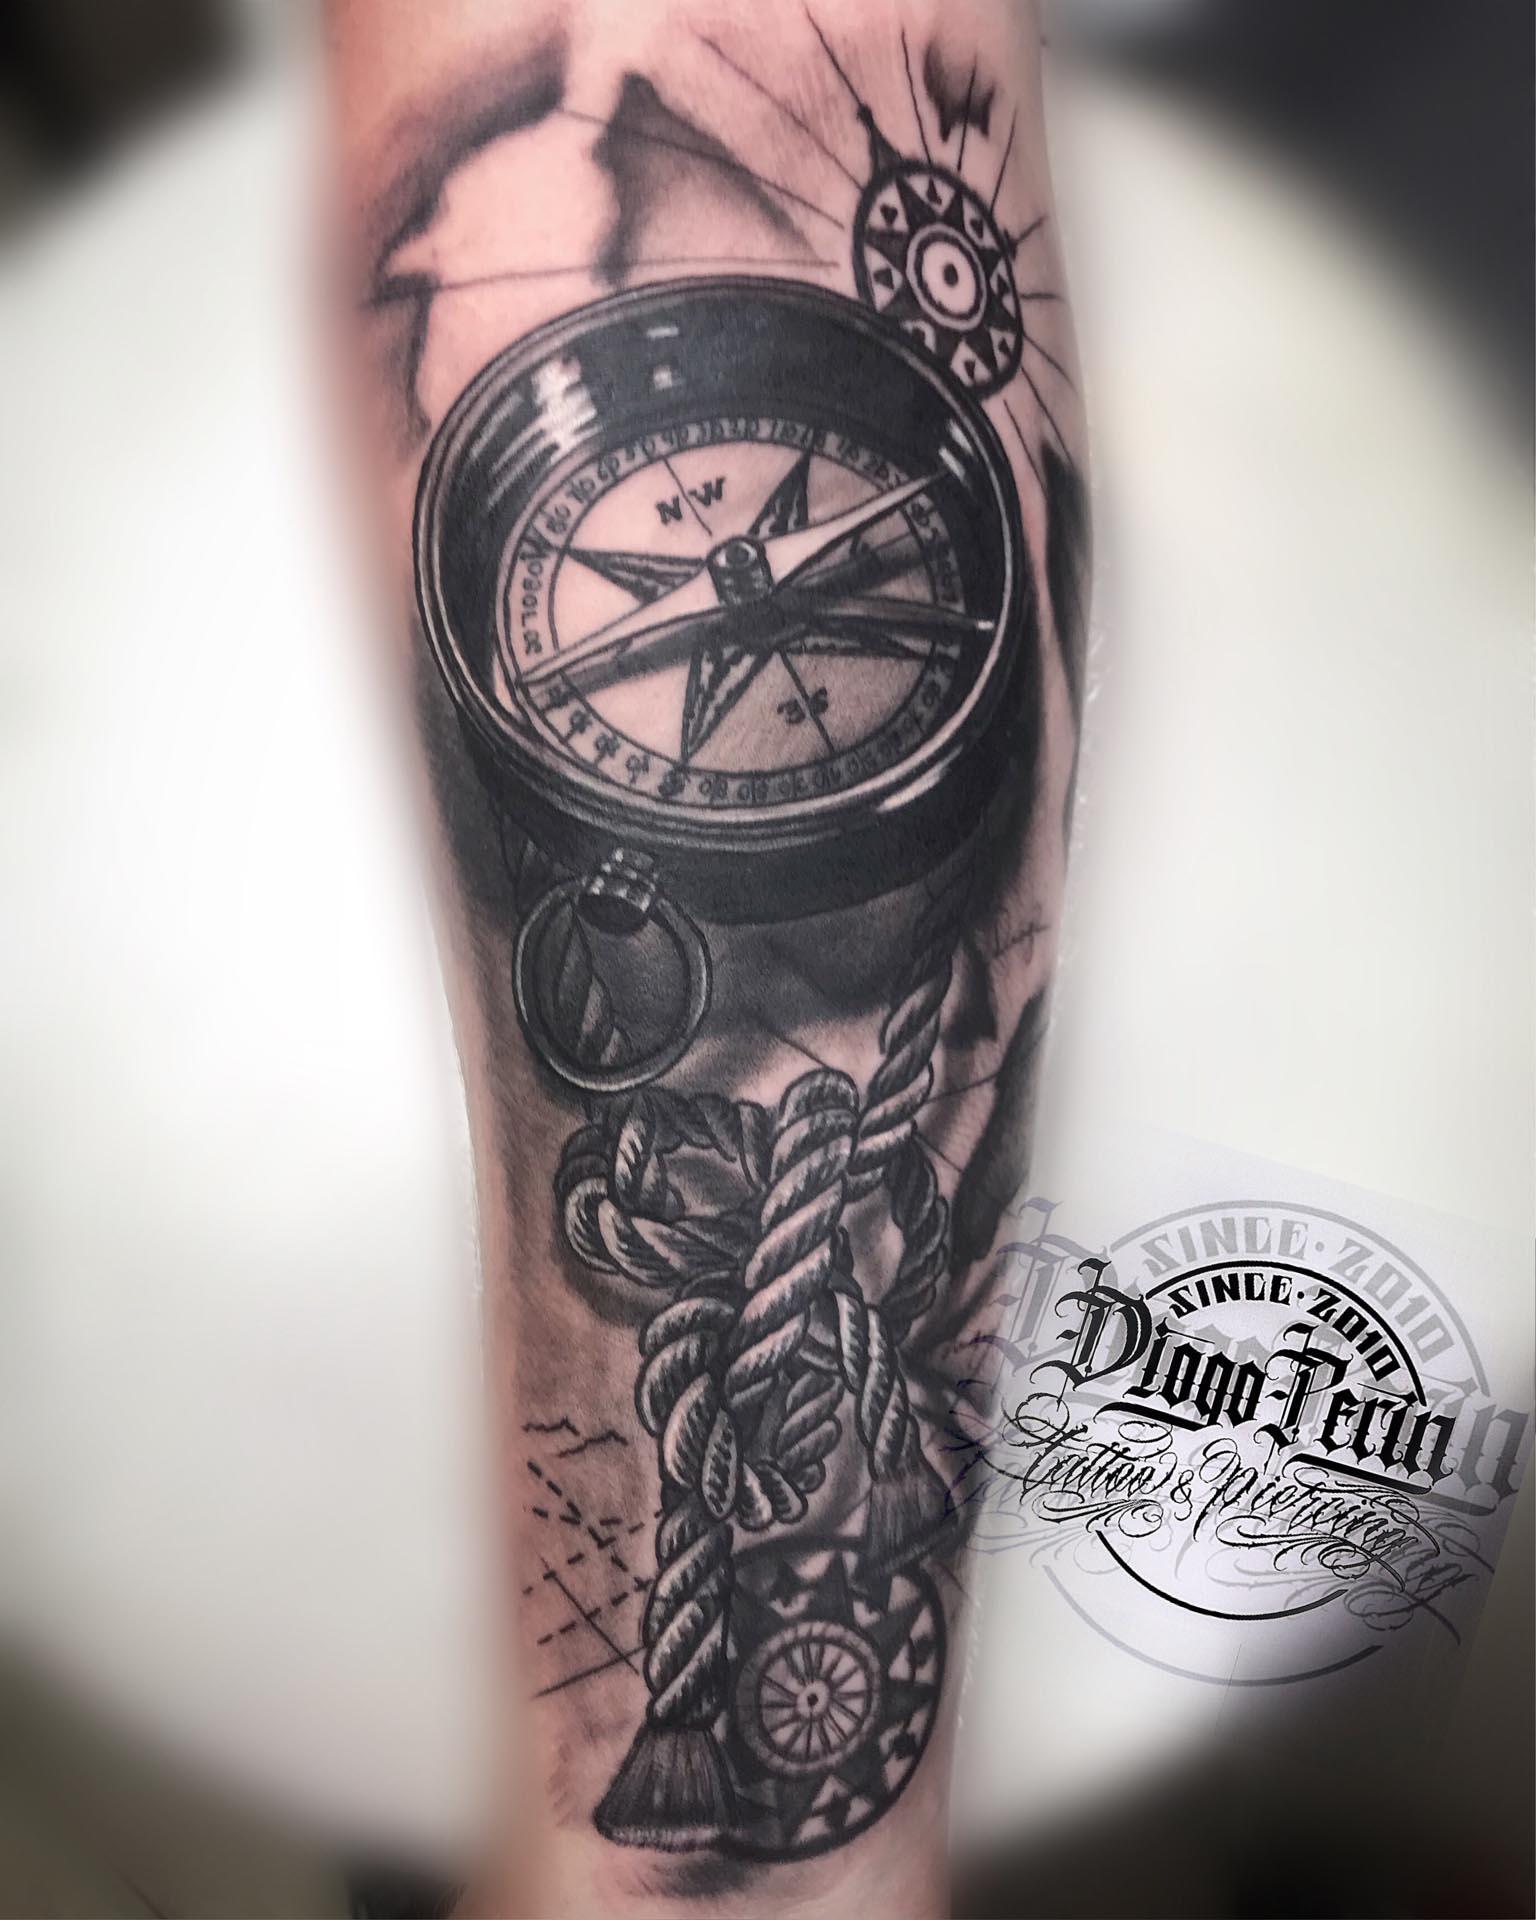 brujula, nudo, carta nautica, realismo, black and grey, byn, alicante, santa pola, tattoo, tatuaje